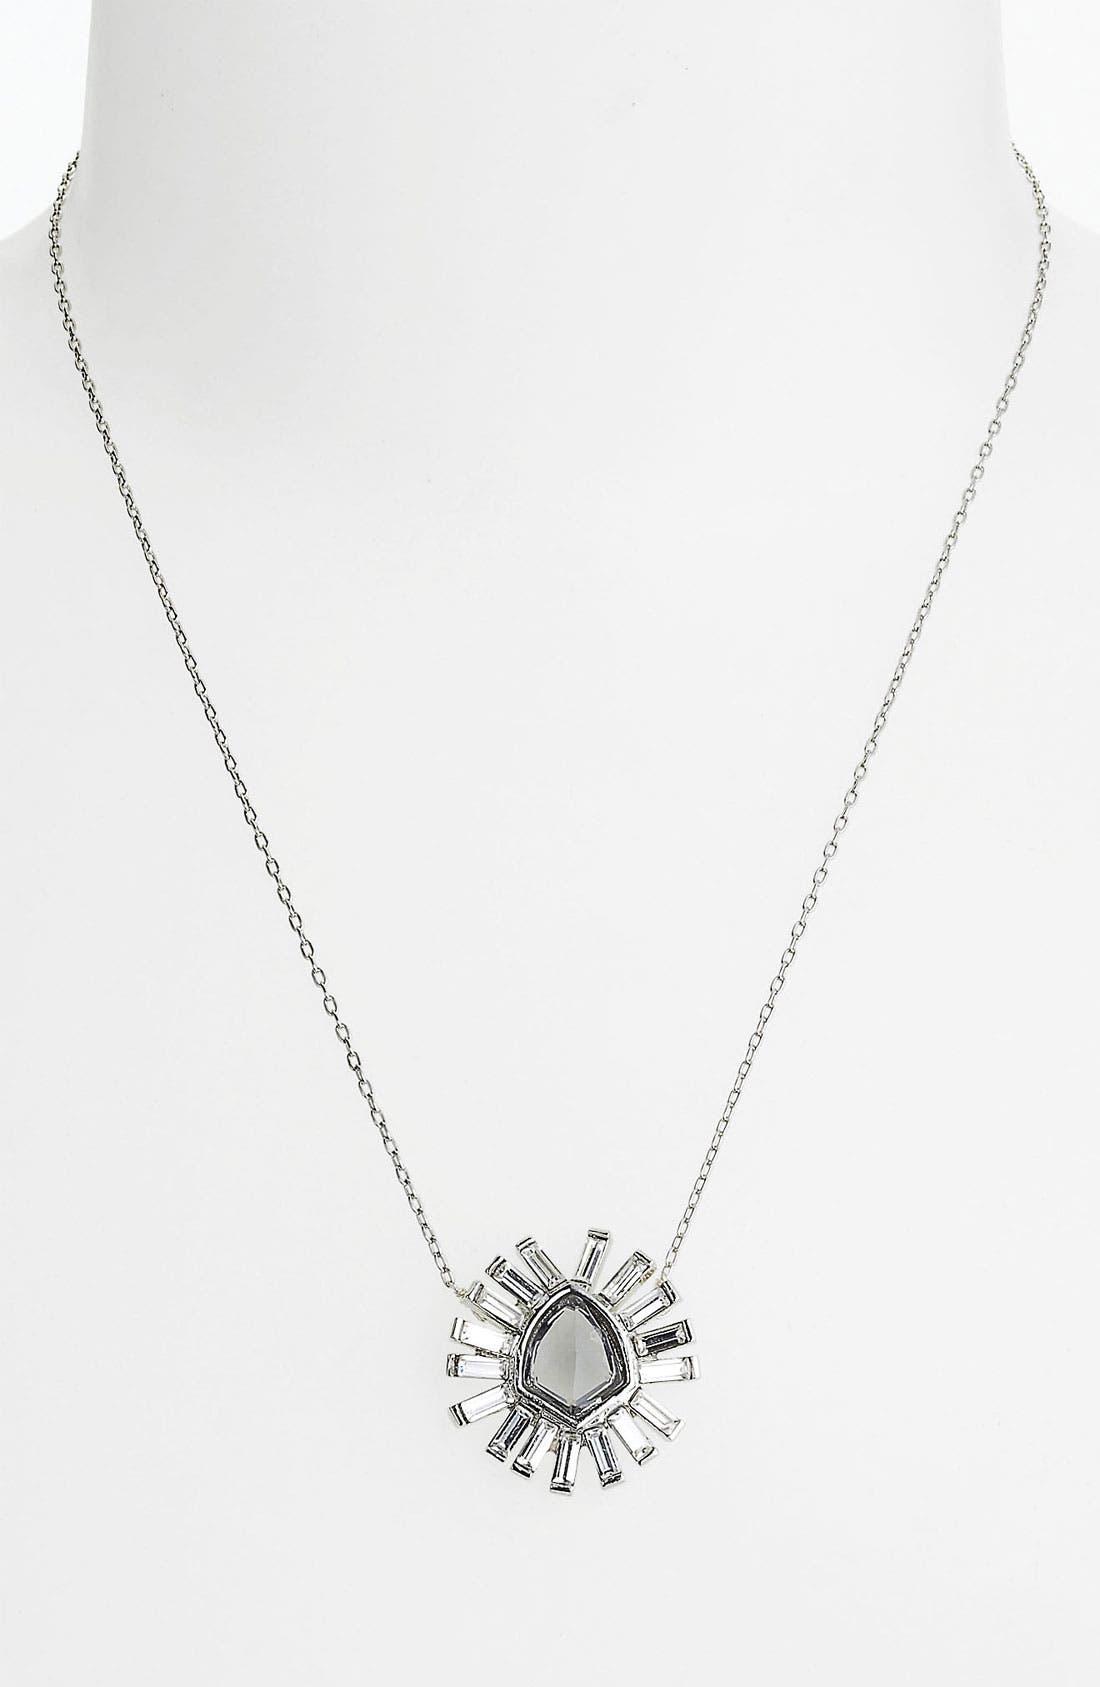 Alternate Image 1 Selected - Alexis Bittar 'Miss Havisham - Bel Air' Starburst Pendant Necklace